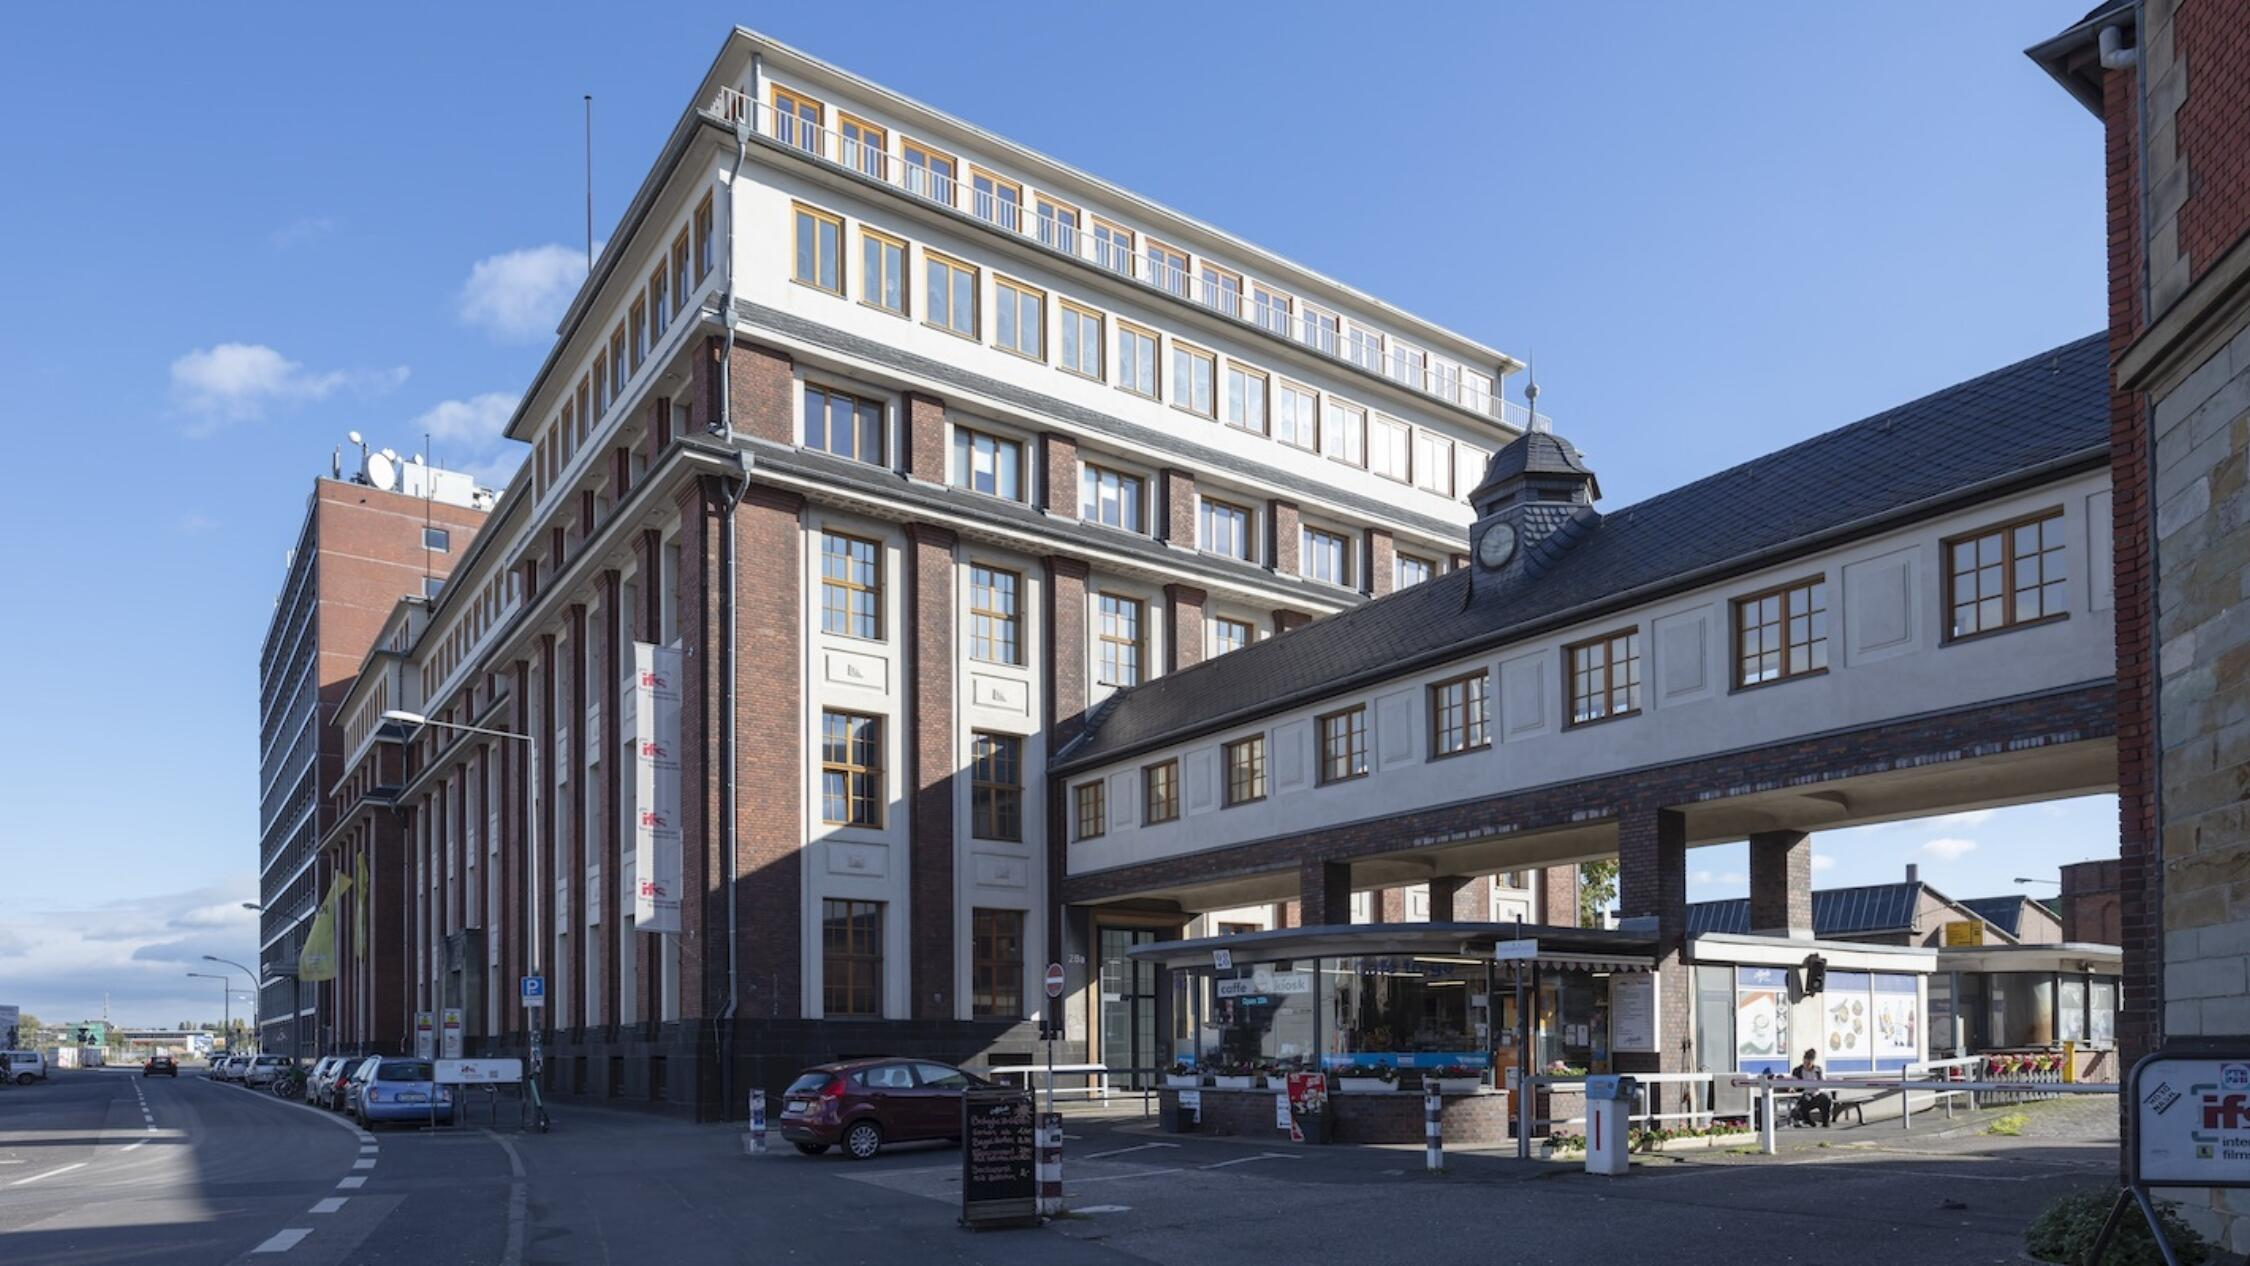 Schanzenstrasse facade with pedestrian footbridge connecting two buildings